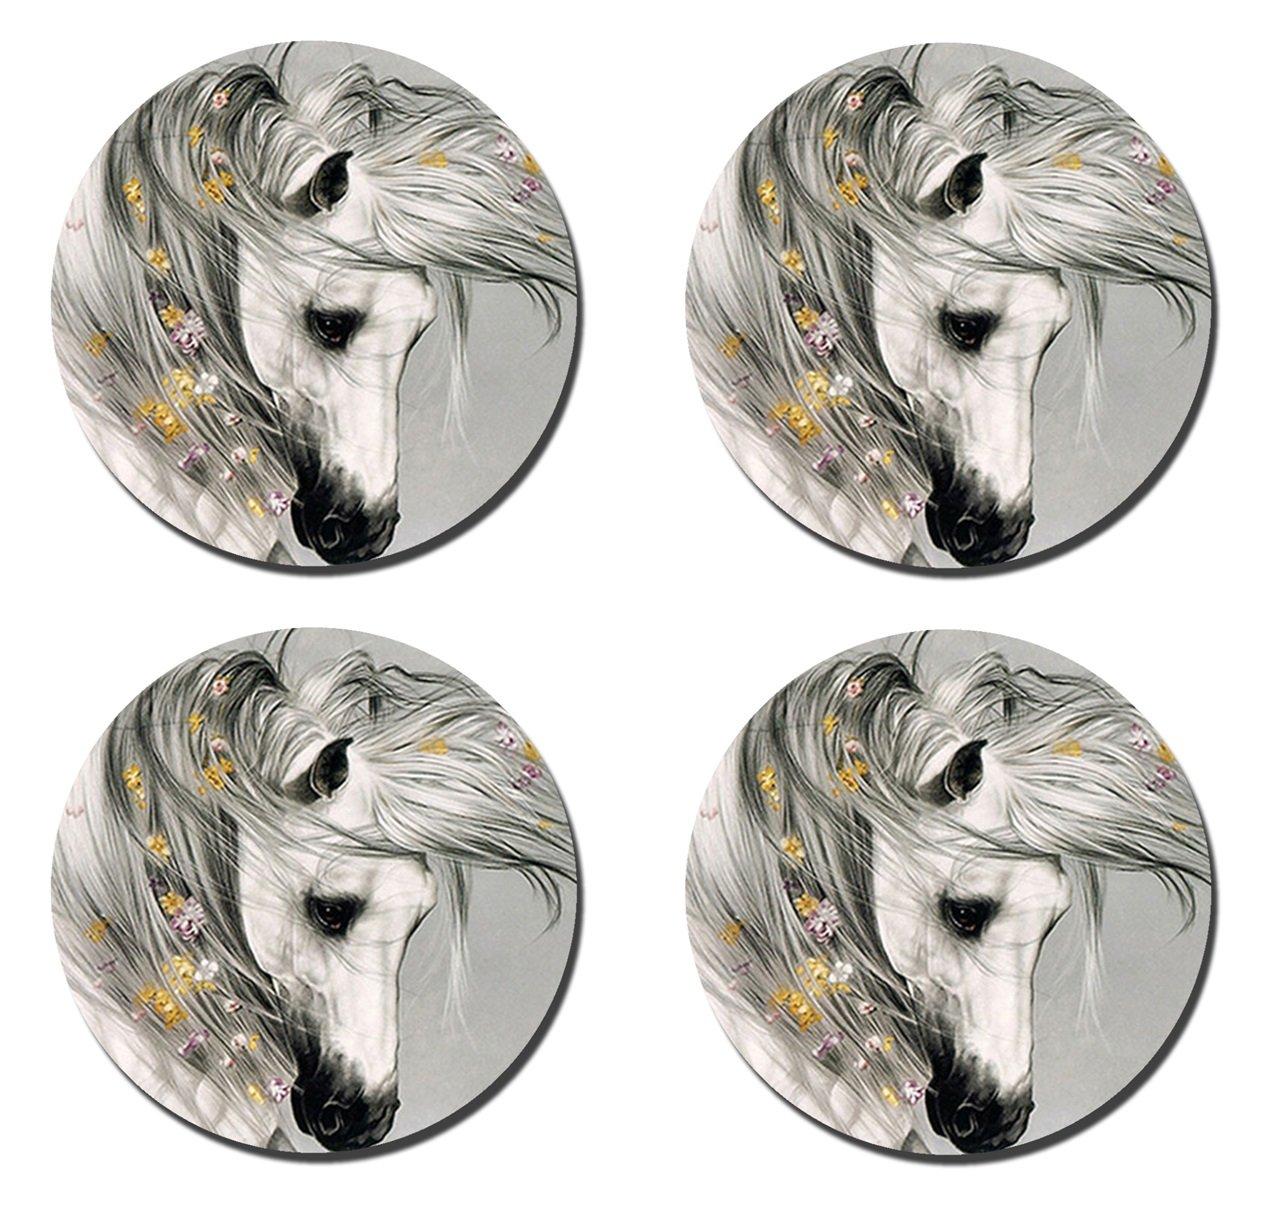 Topa Horseシリーズカスタムファッションクラシックコルクマットラウンドコースター4枚セットマグケトルBeverageキッチンホームコースター 9.5x9.5x0.5 Inches  Abstract Horse-2 B07FB8GQSJ